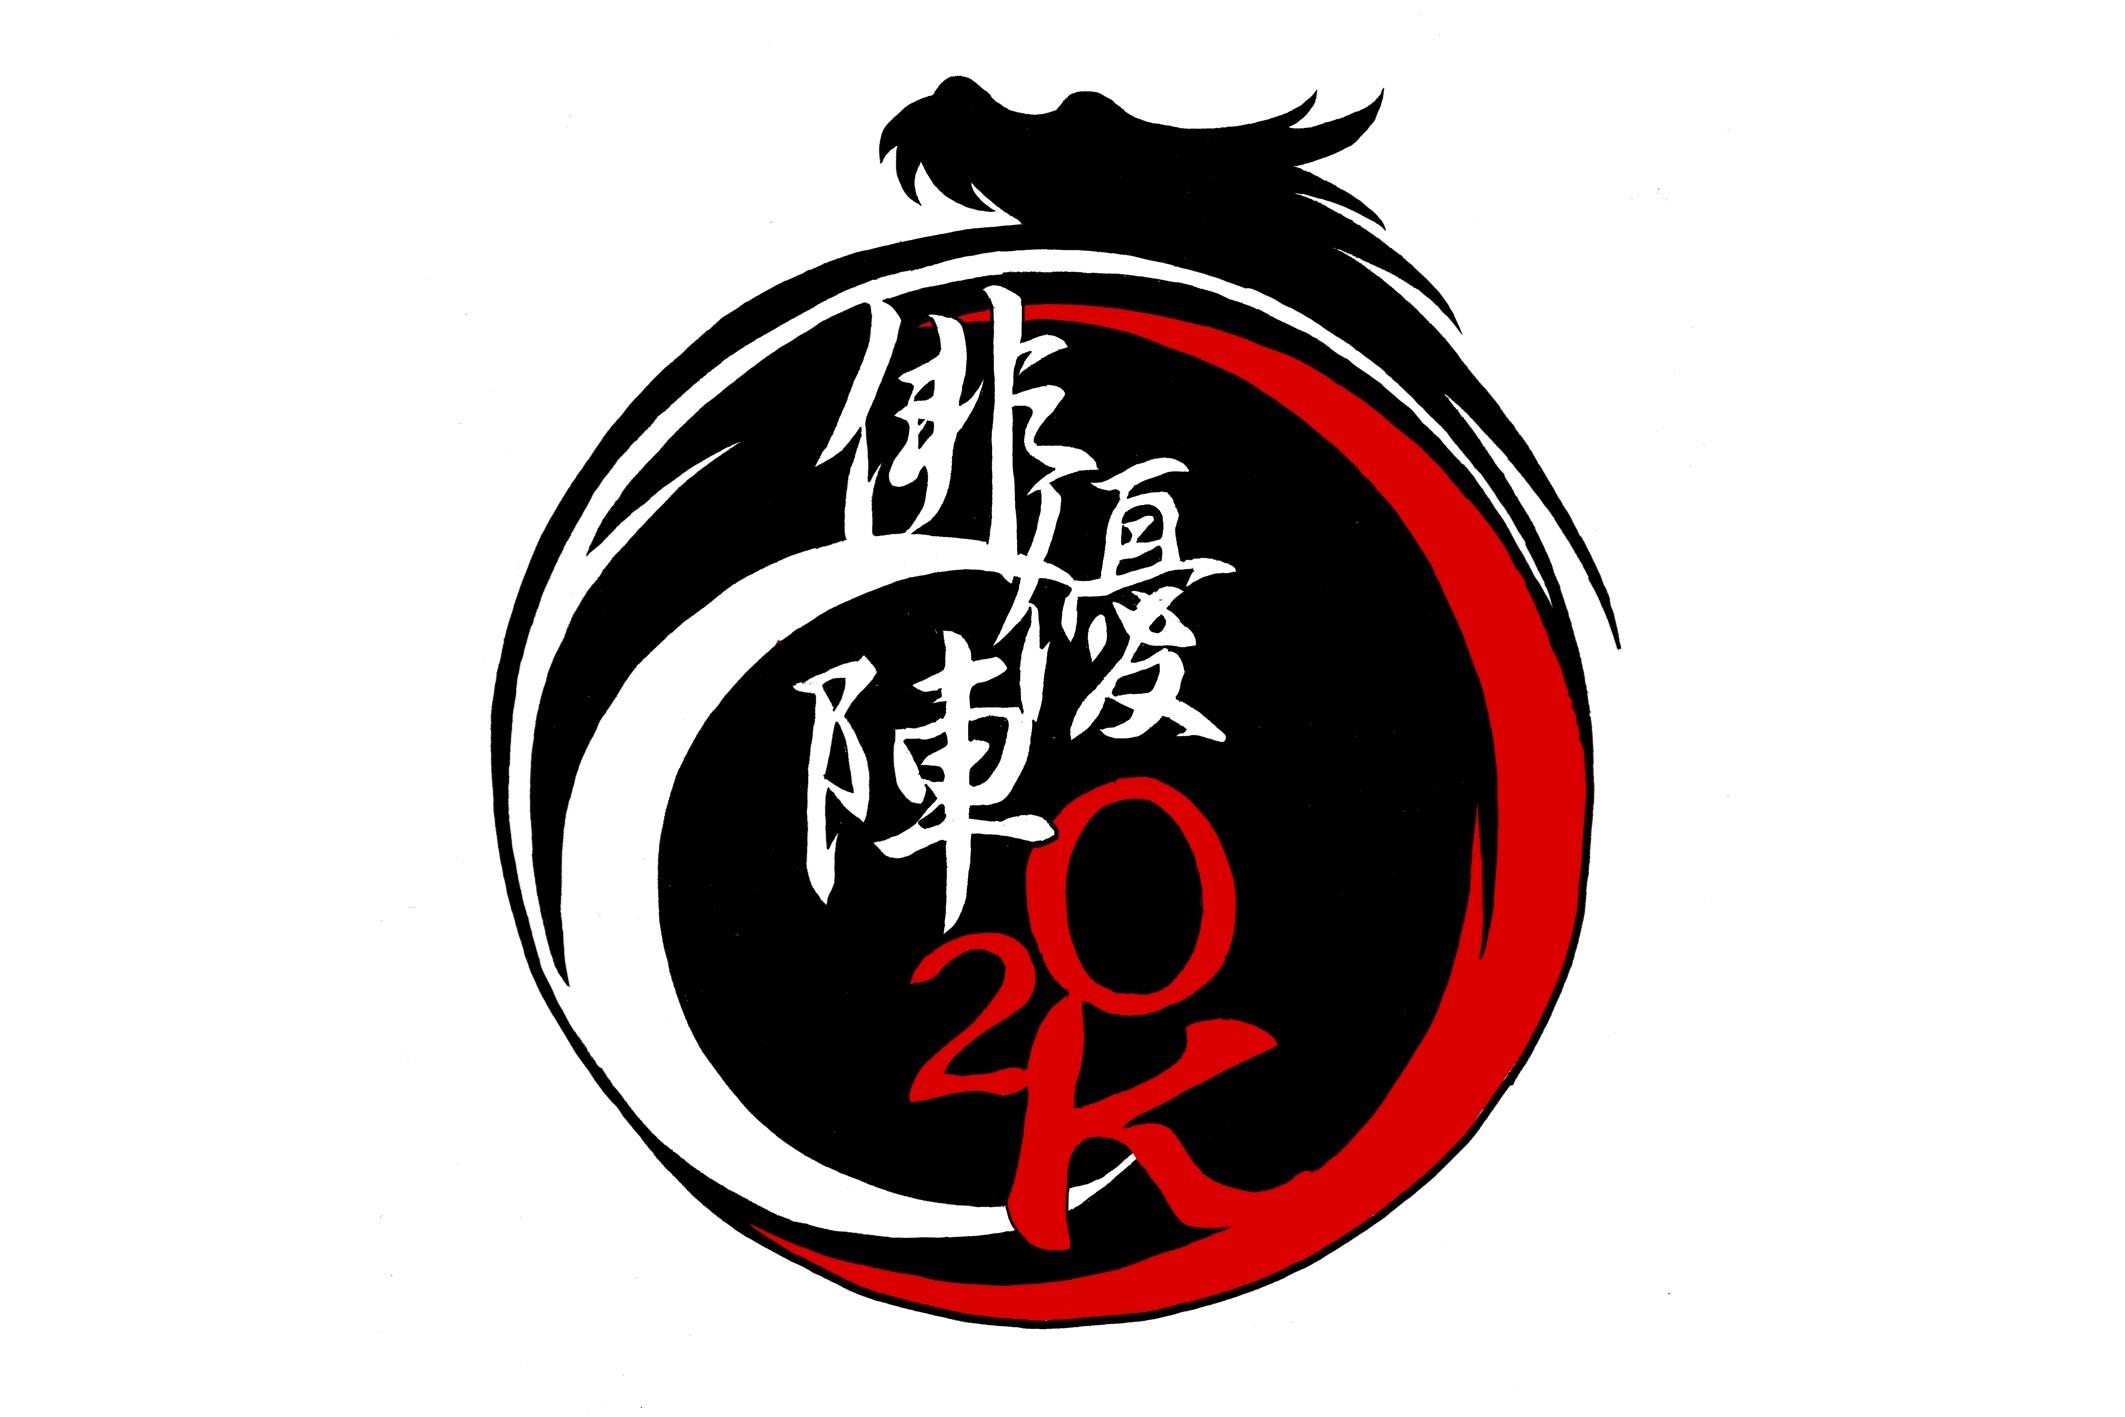 俳優陣O2K